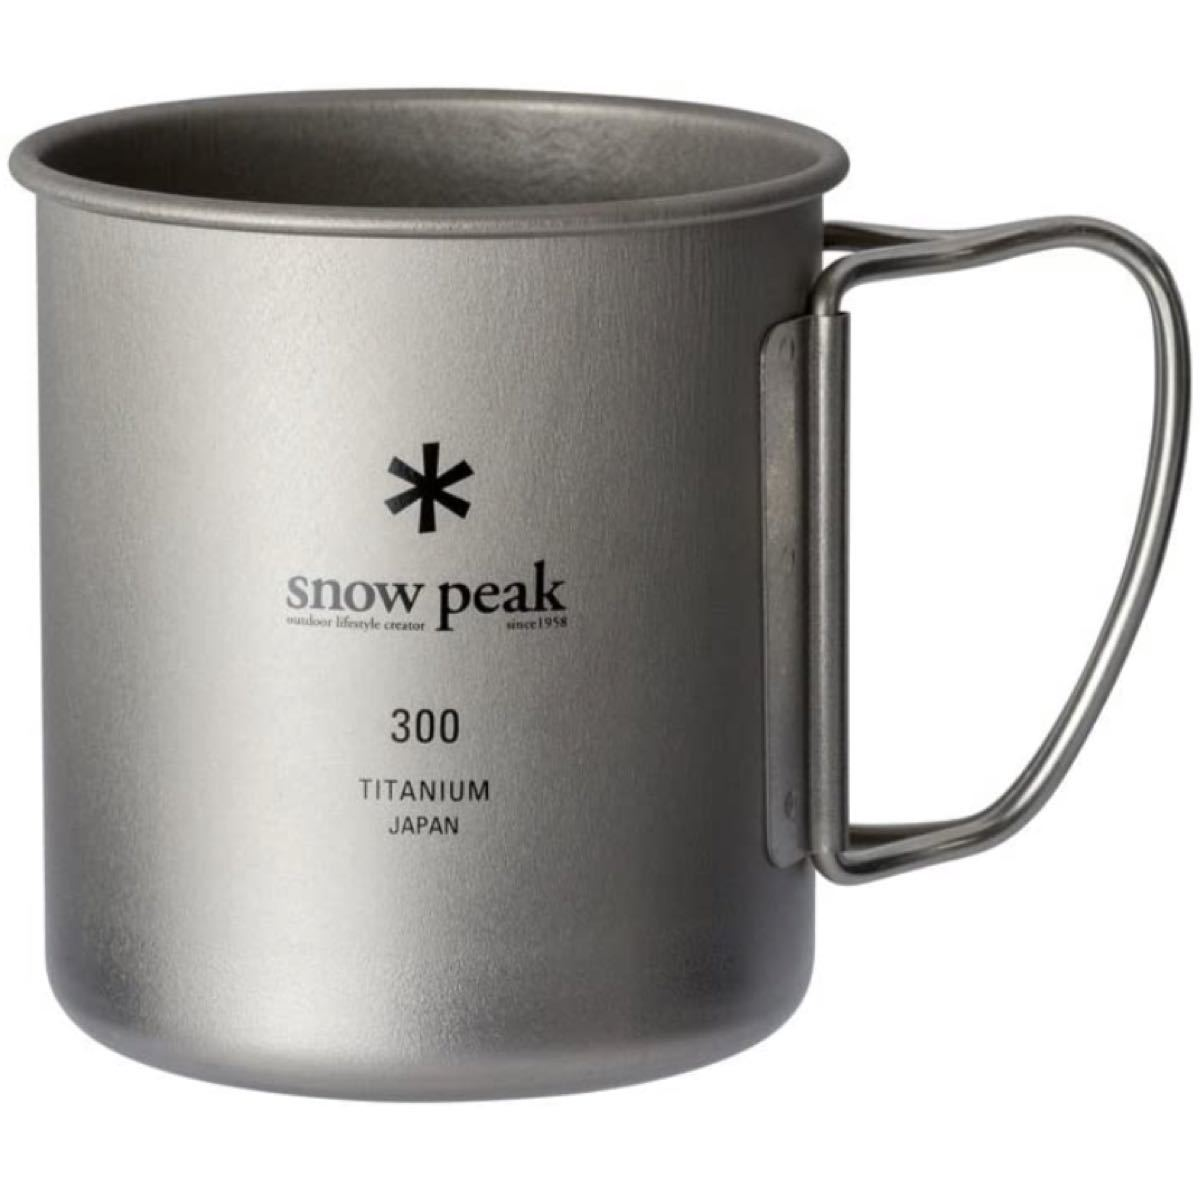 snow peak スノーピーク チタンシングルマグ 300  マグカップ